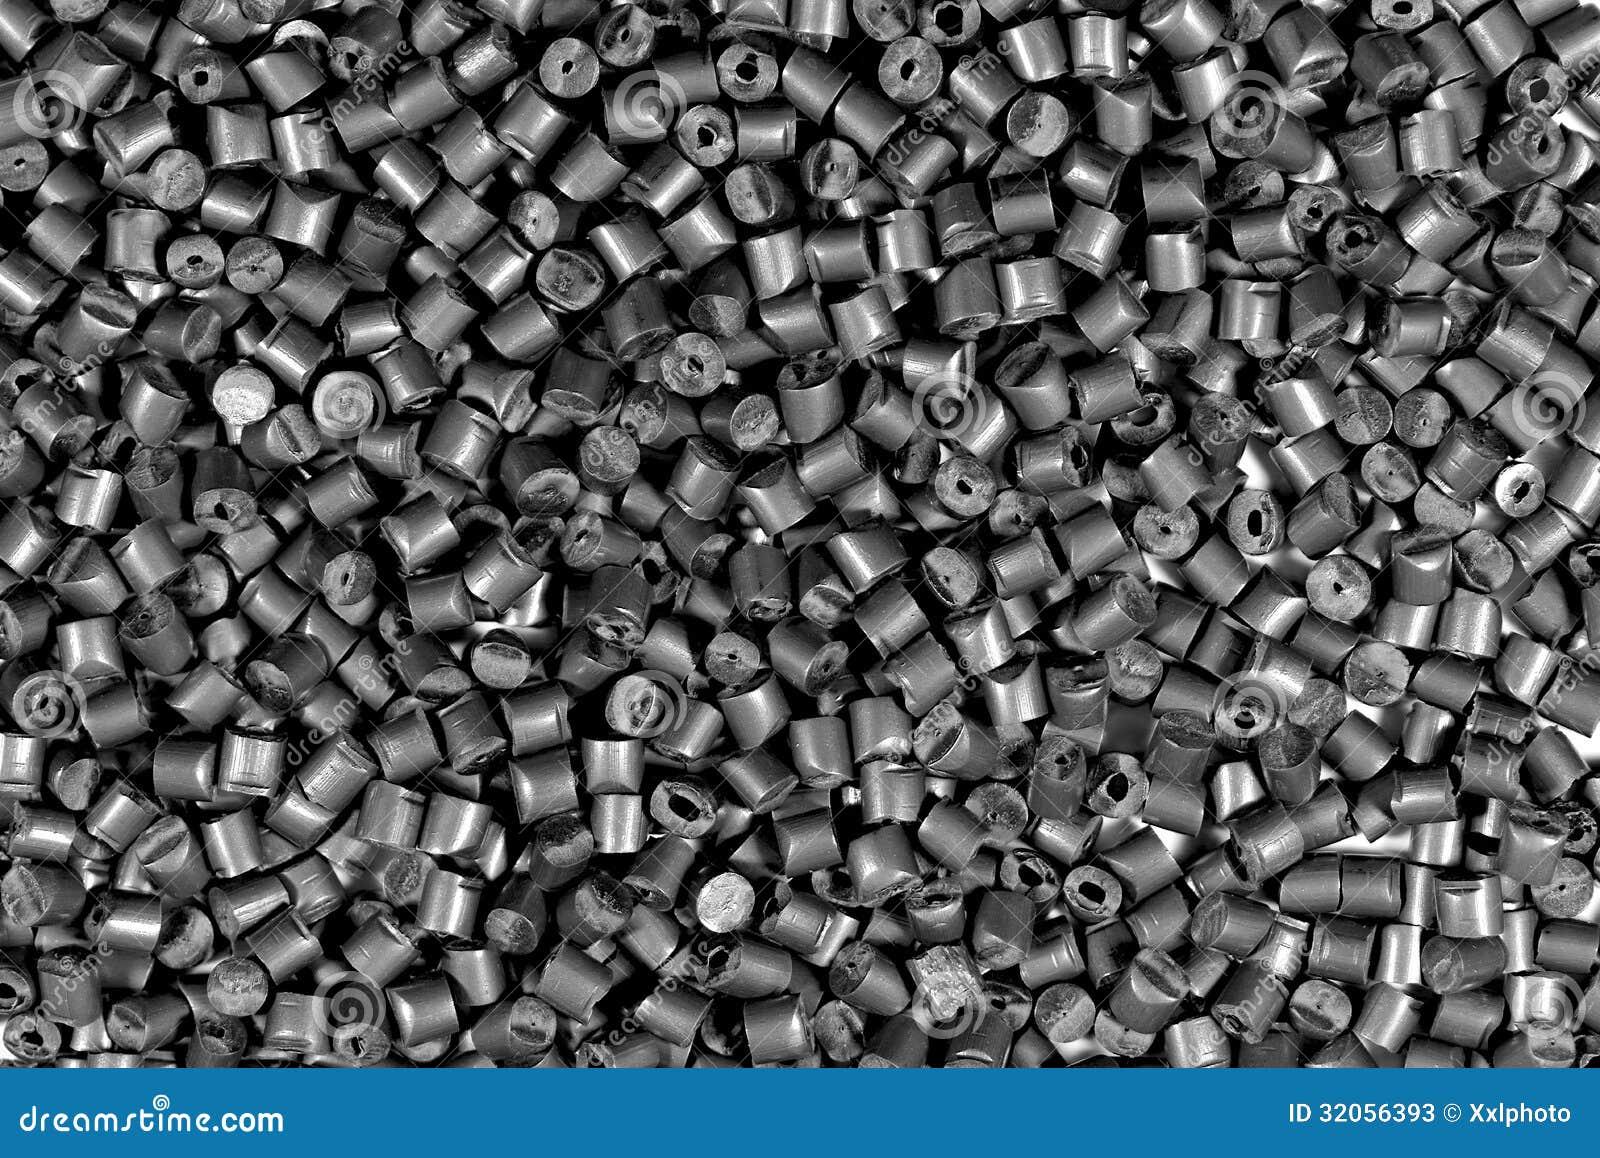 Gray metallic polymer